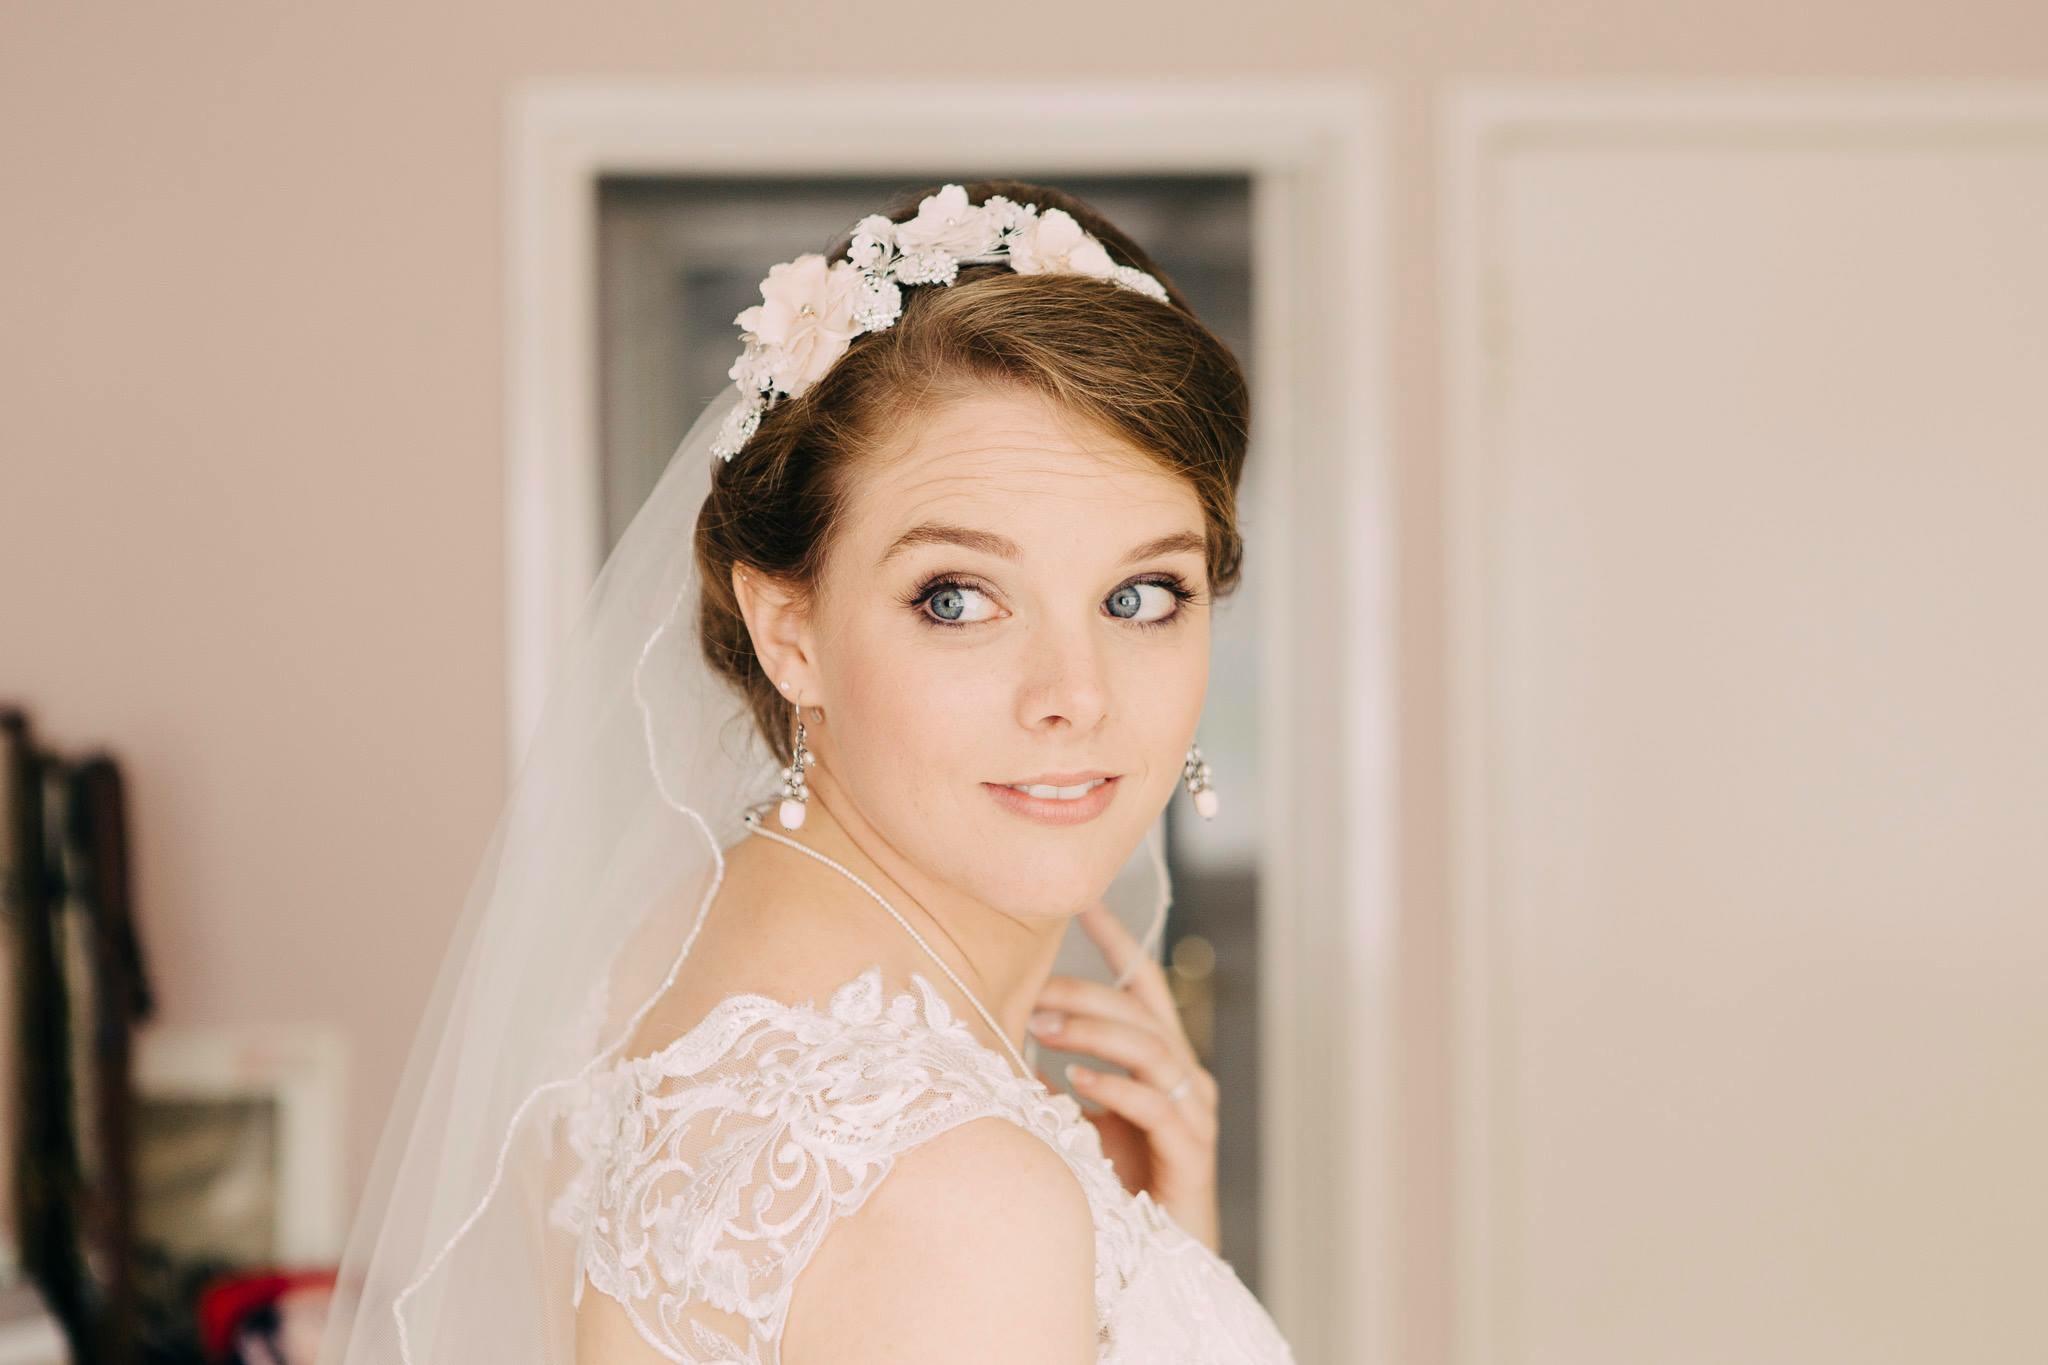 Amazing Face Bridal Hair And Makeup Dorset